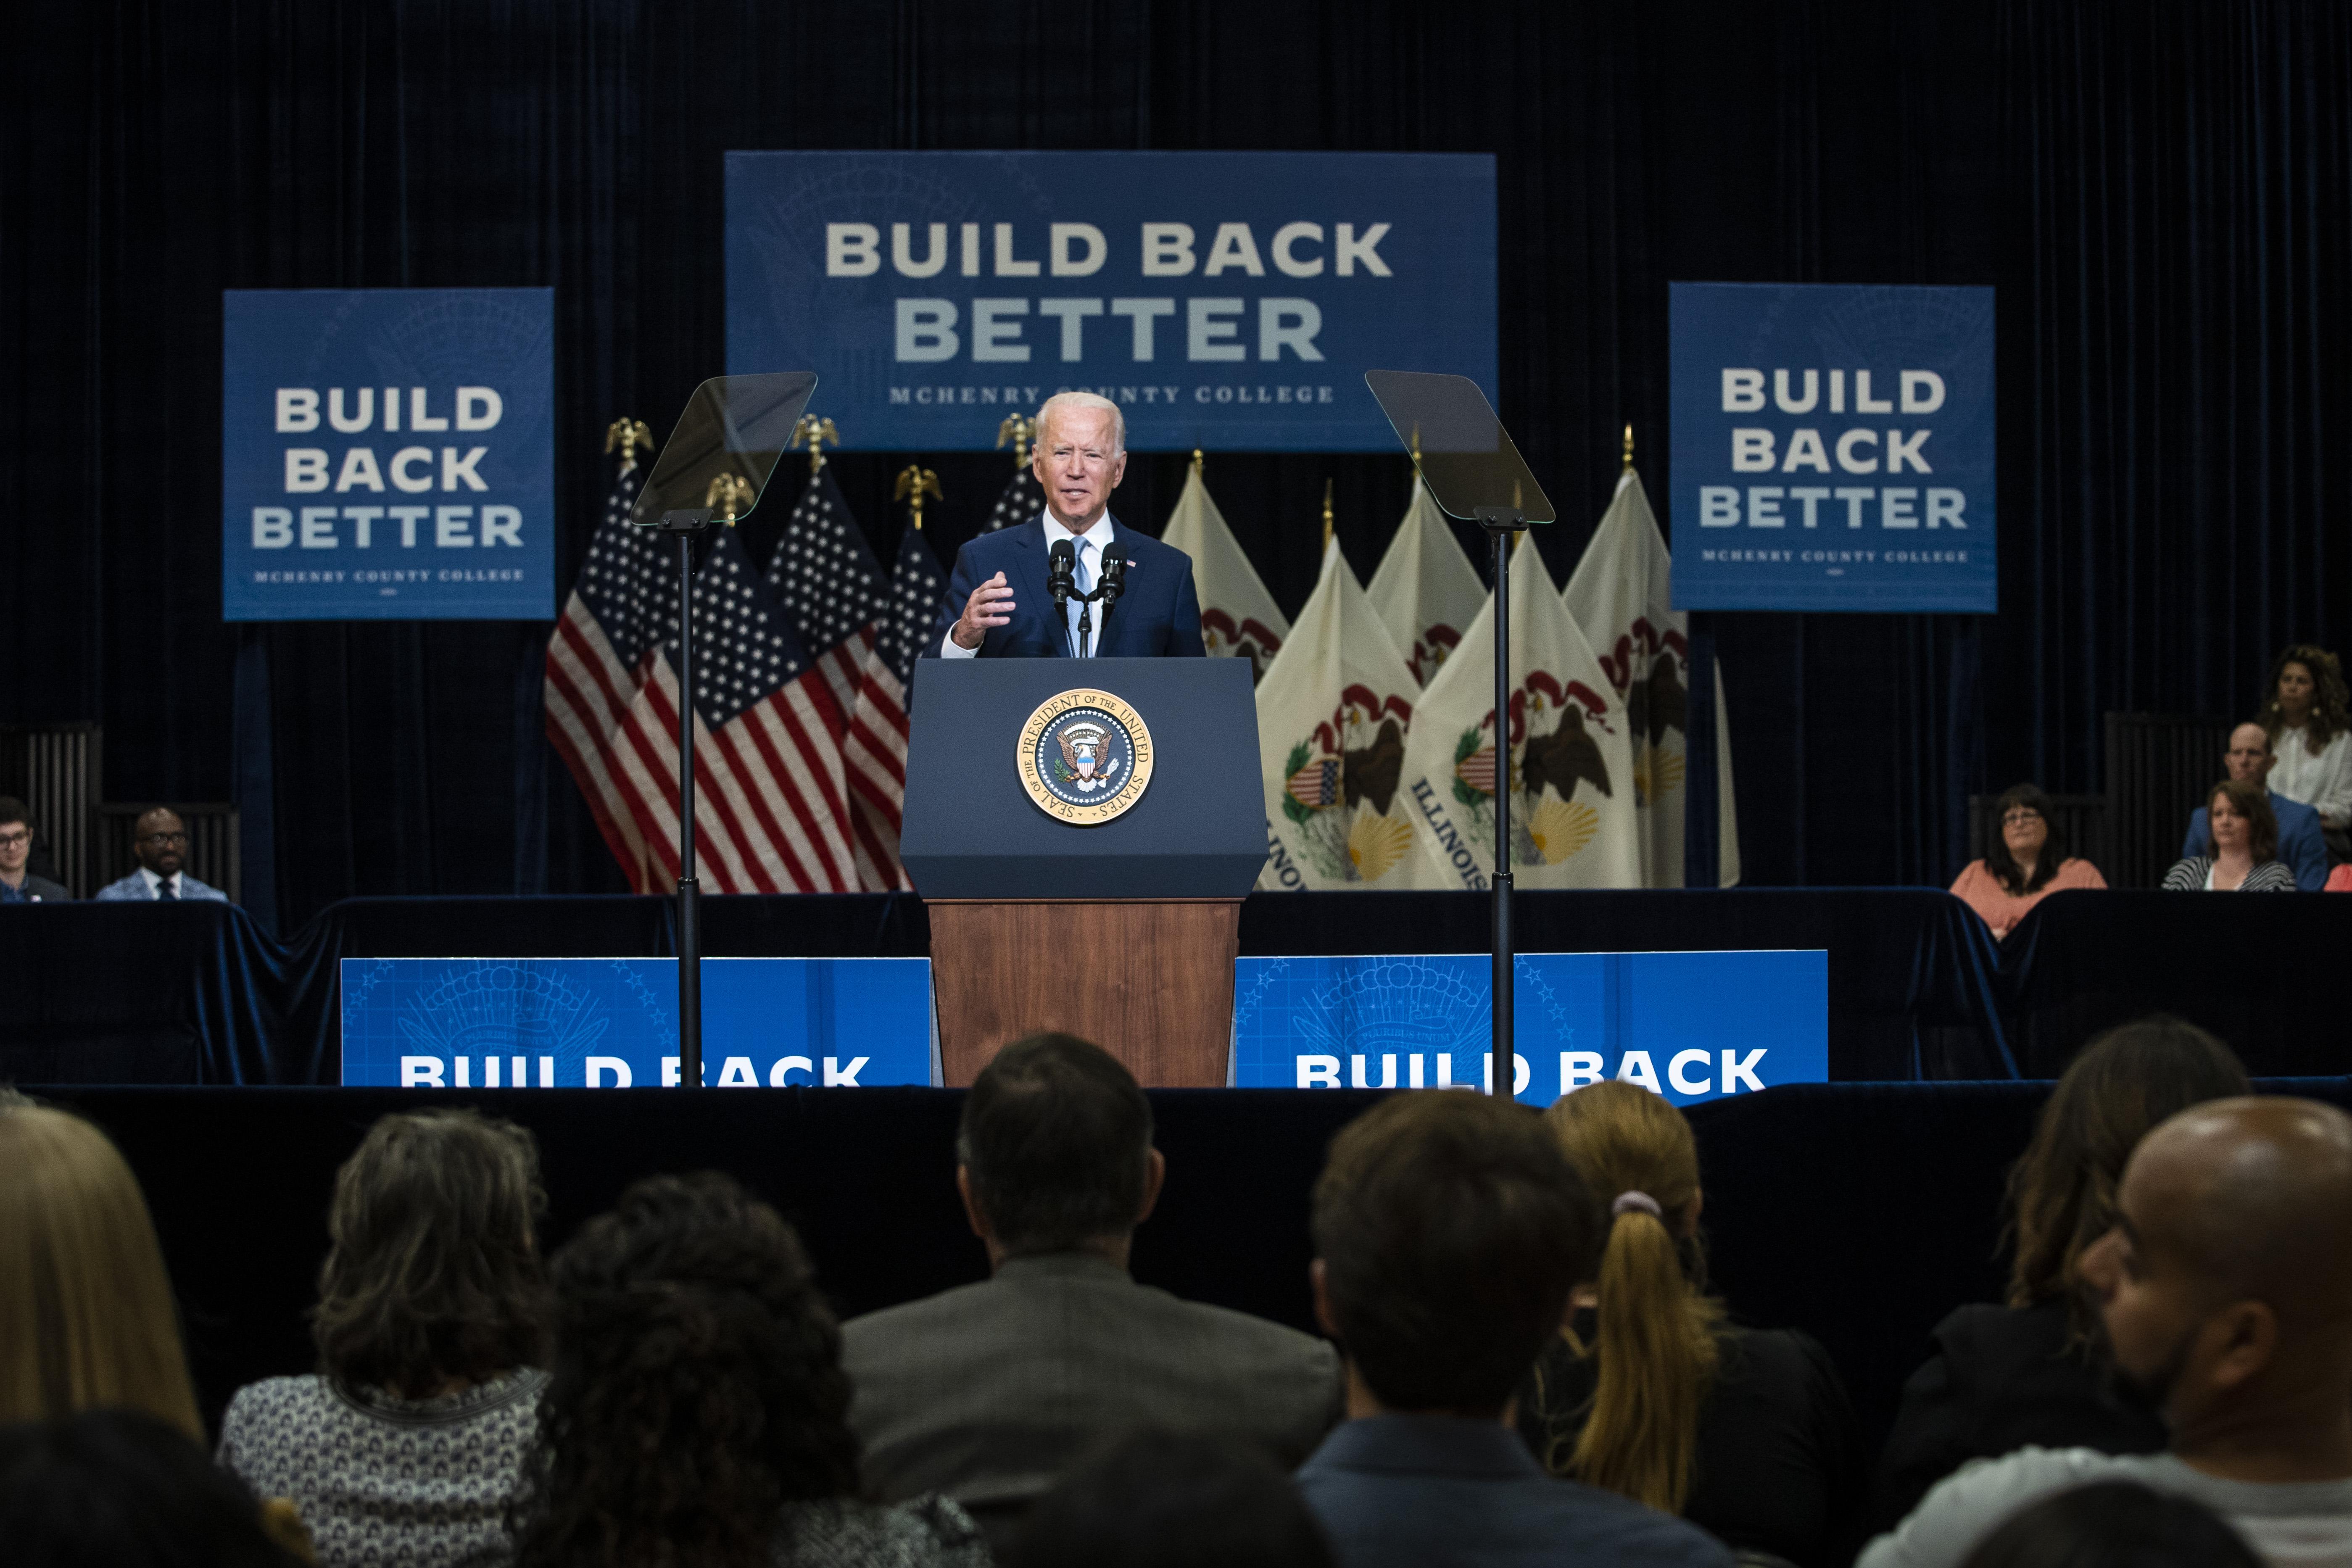 President Joe Biden speaks at McHenry County College in Crystal Lake in July.